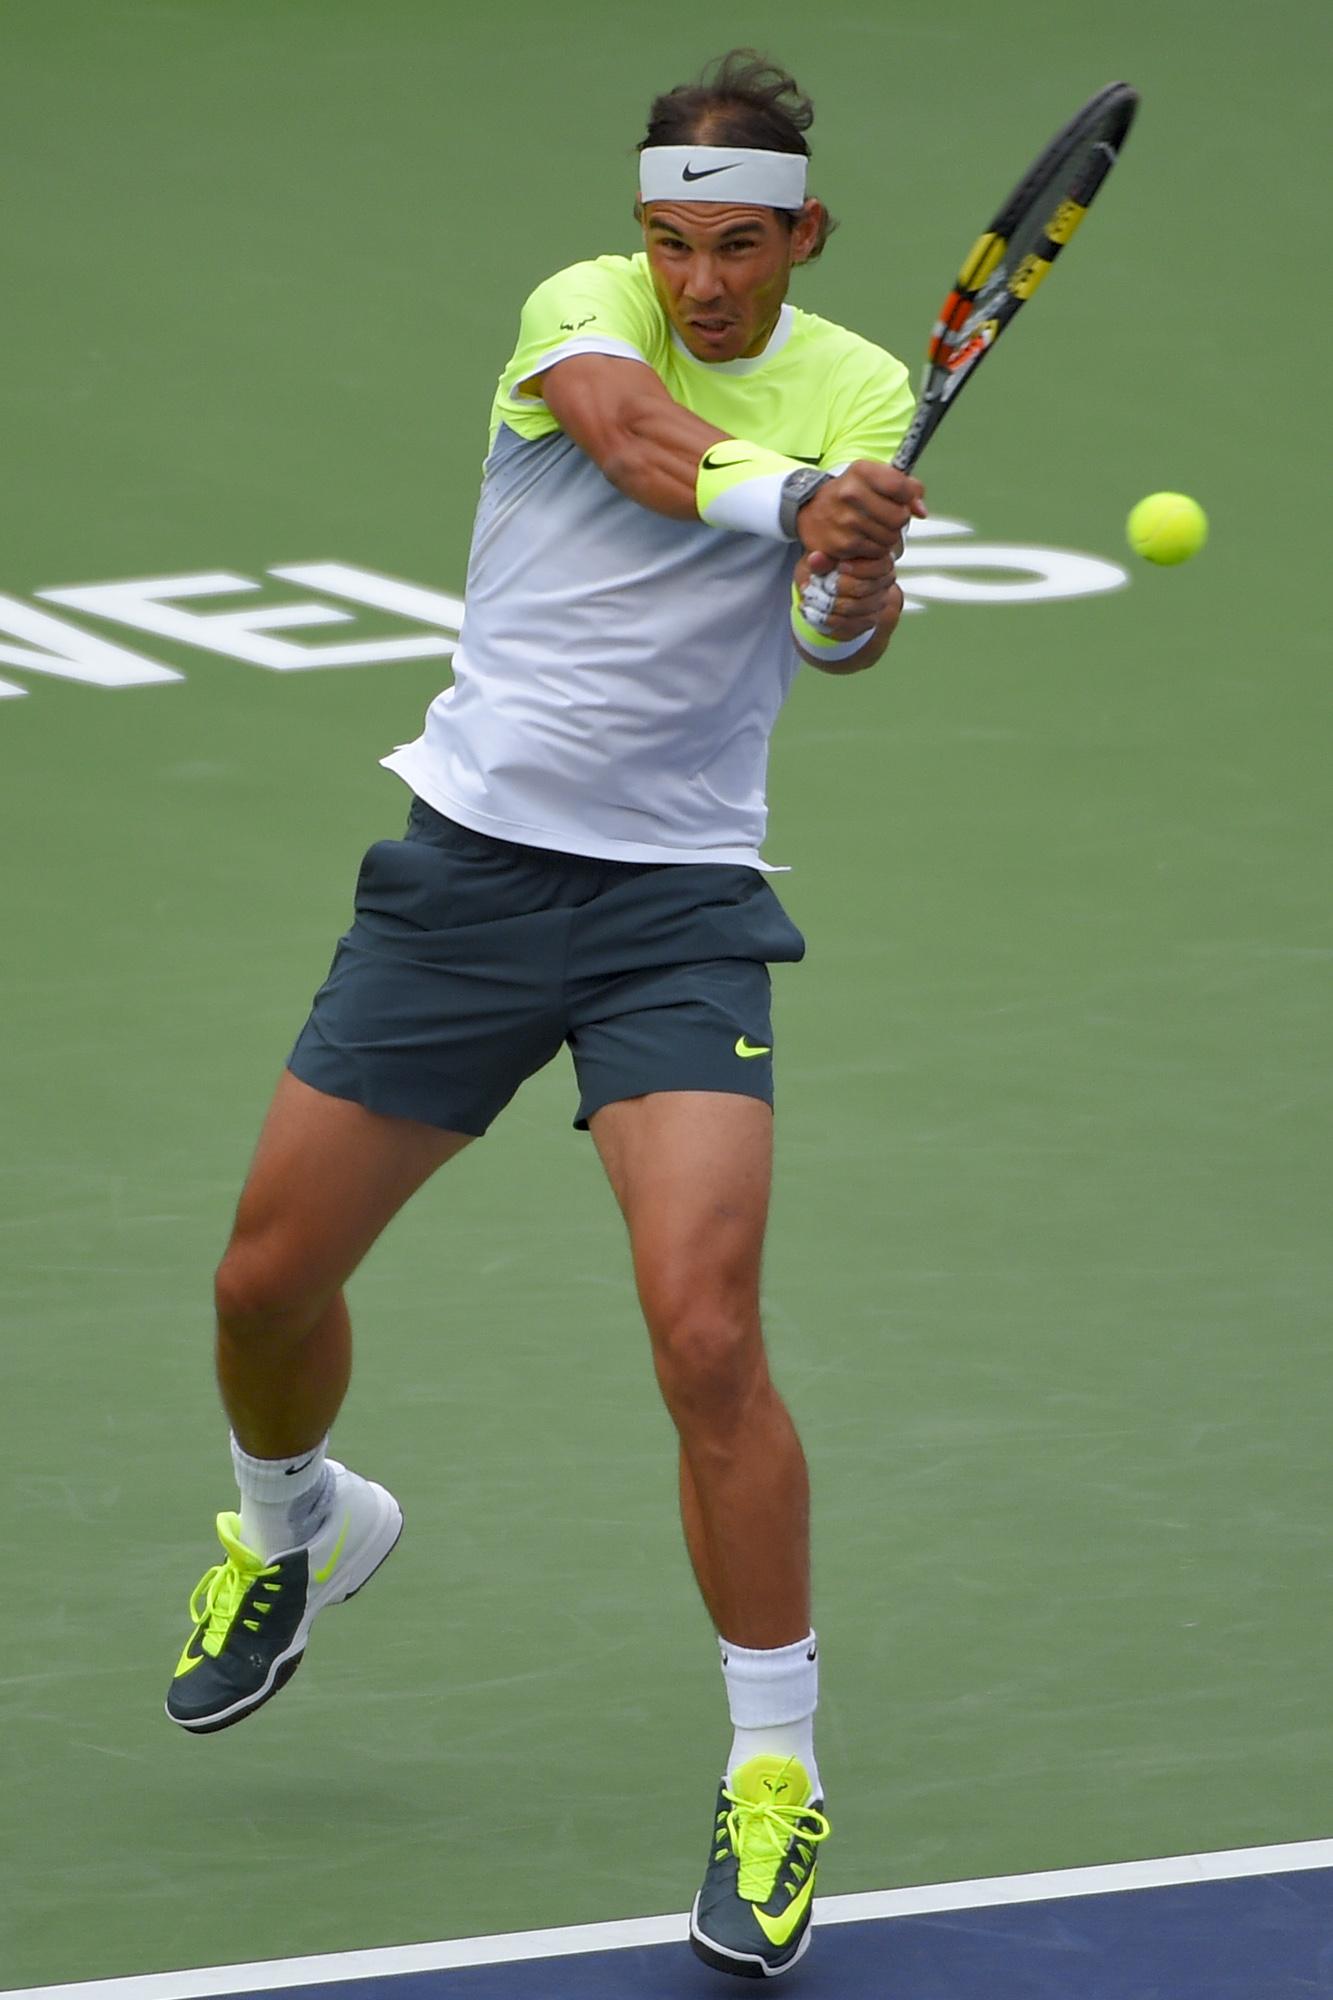 PHOTOS: Rafael Nadal beats Gilles Simon to reach Indian Wells quarterfinals – Rafael Nadal Fans